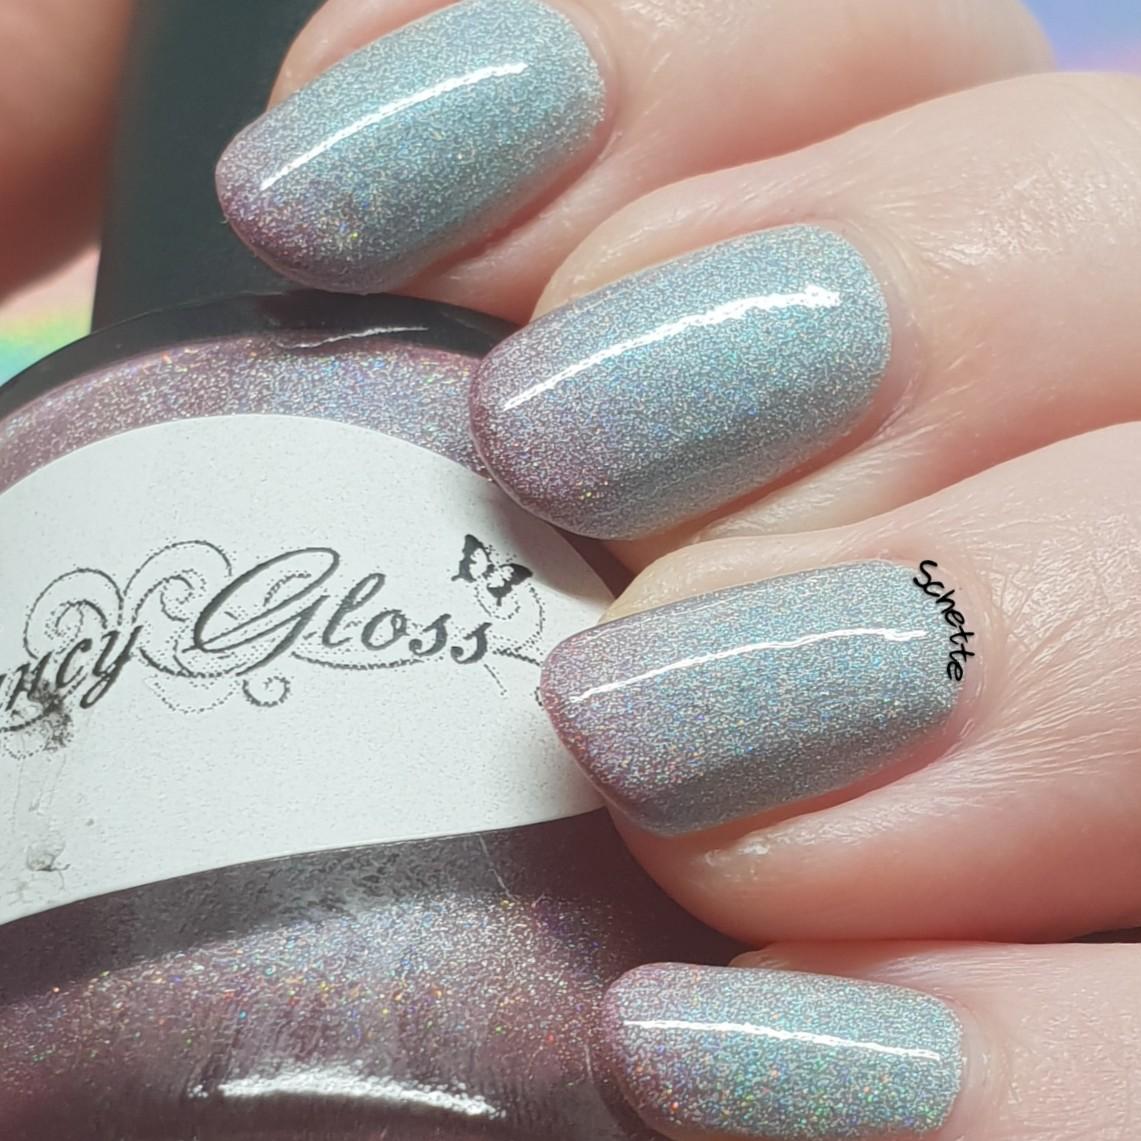 Fancy Gloss - Turn back Time